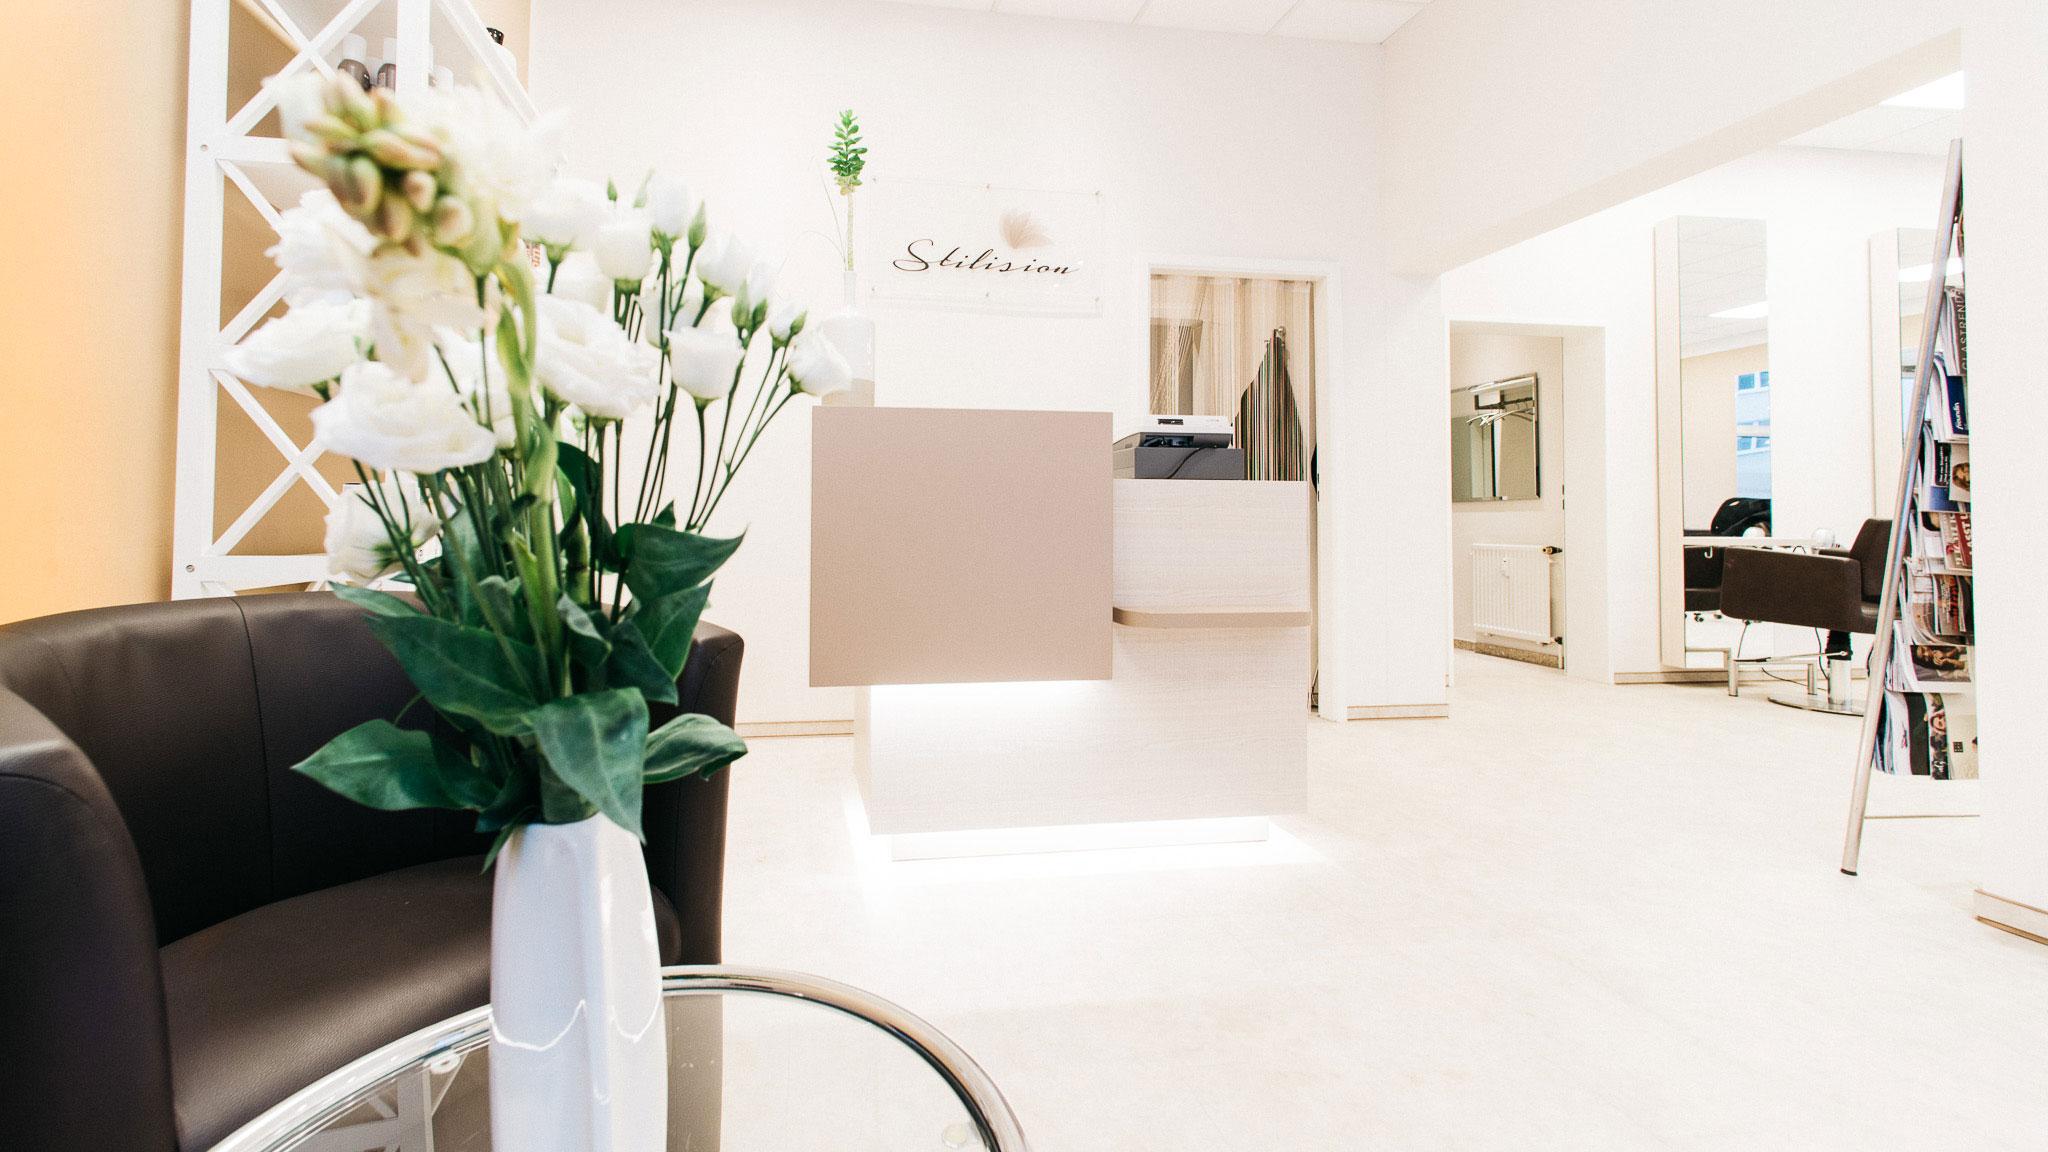 Empfang Stilision – Friseur am Schweizerhof in Hannover